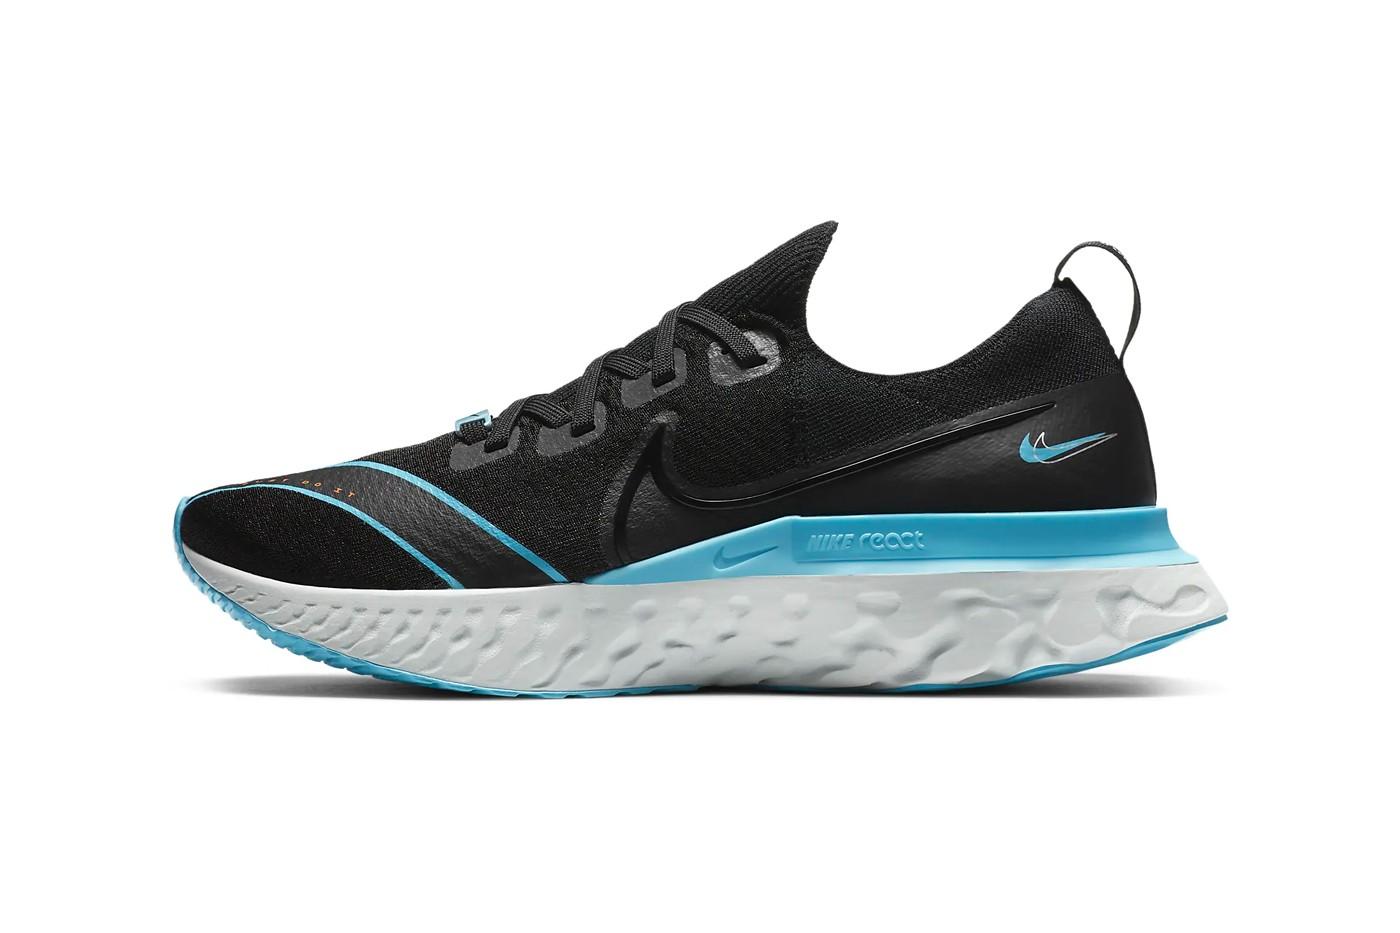 Nike React Infinity Run Blue Fury